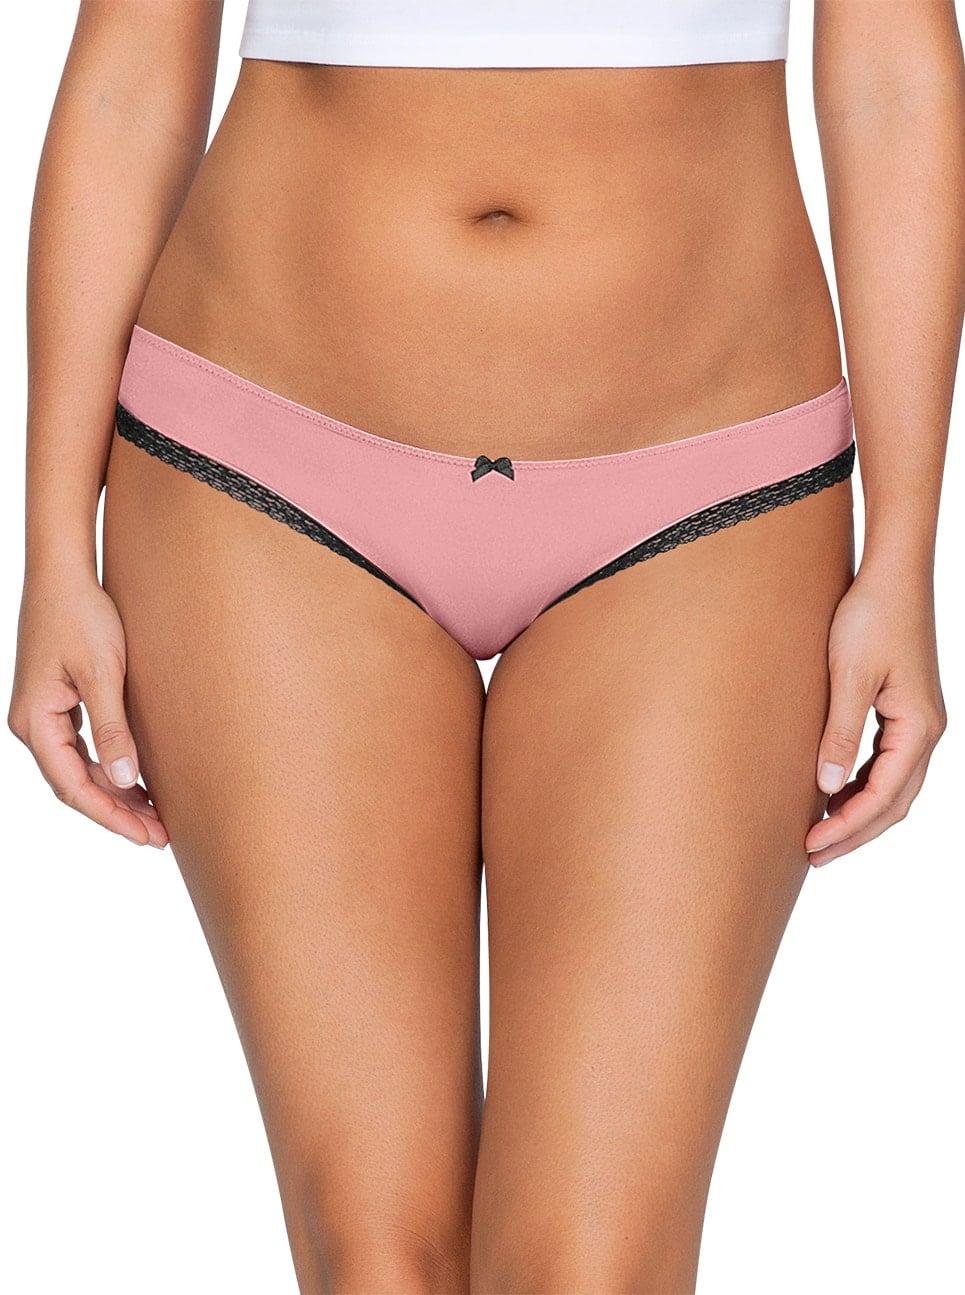 ParfaitPanty Solovely Bikini PP301 D PinkFront - So Lovely Bikini Quartz Pink PP301